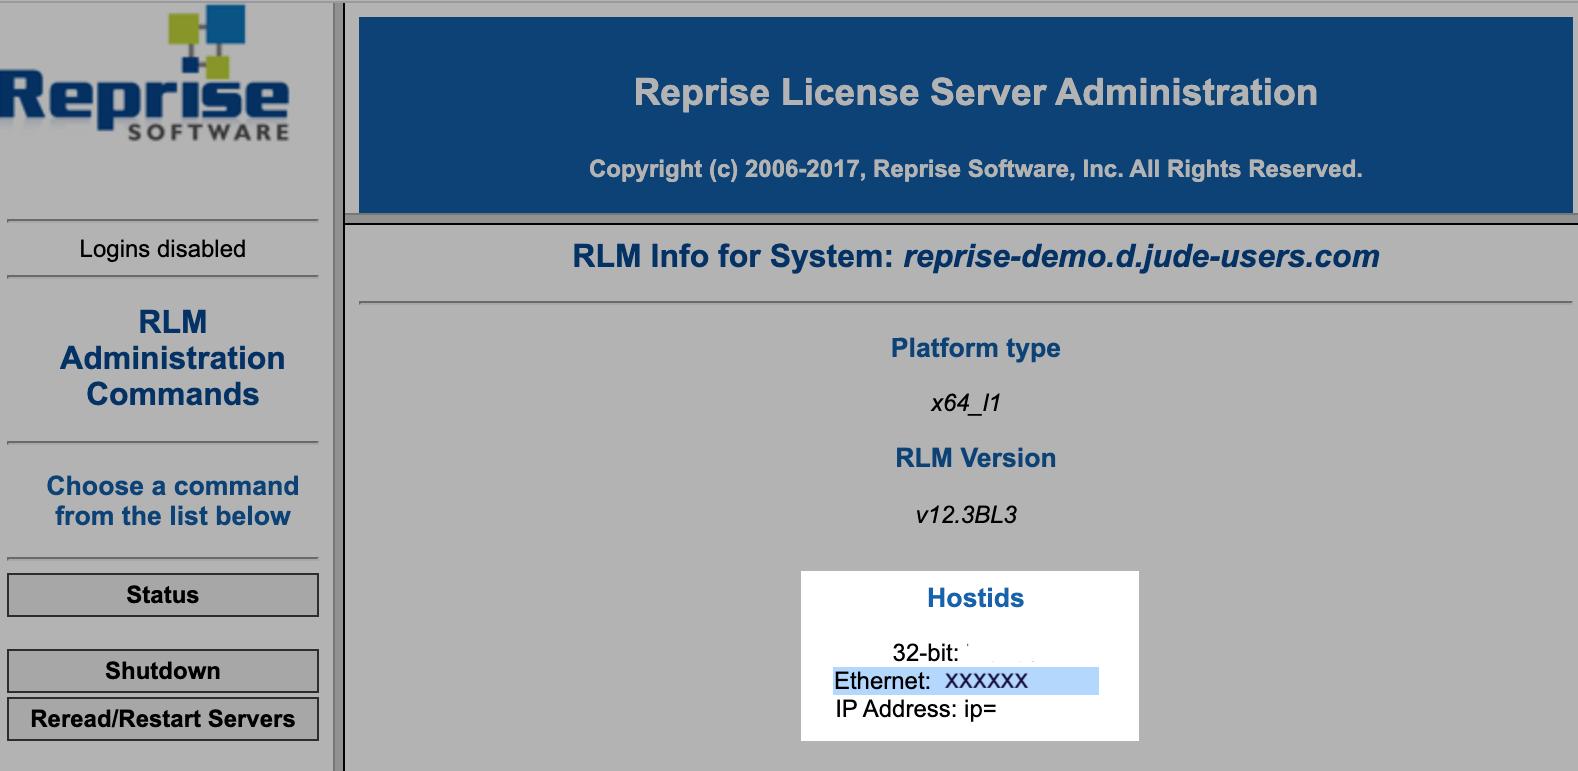 Host ID